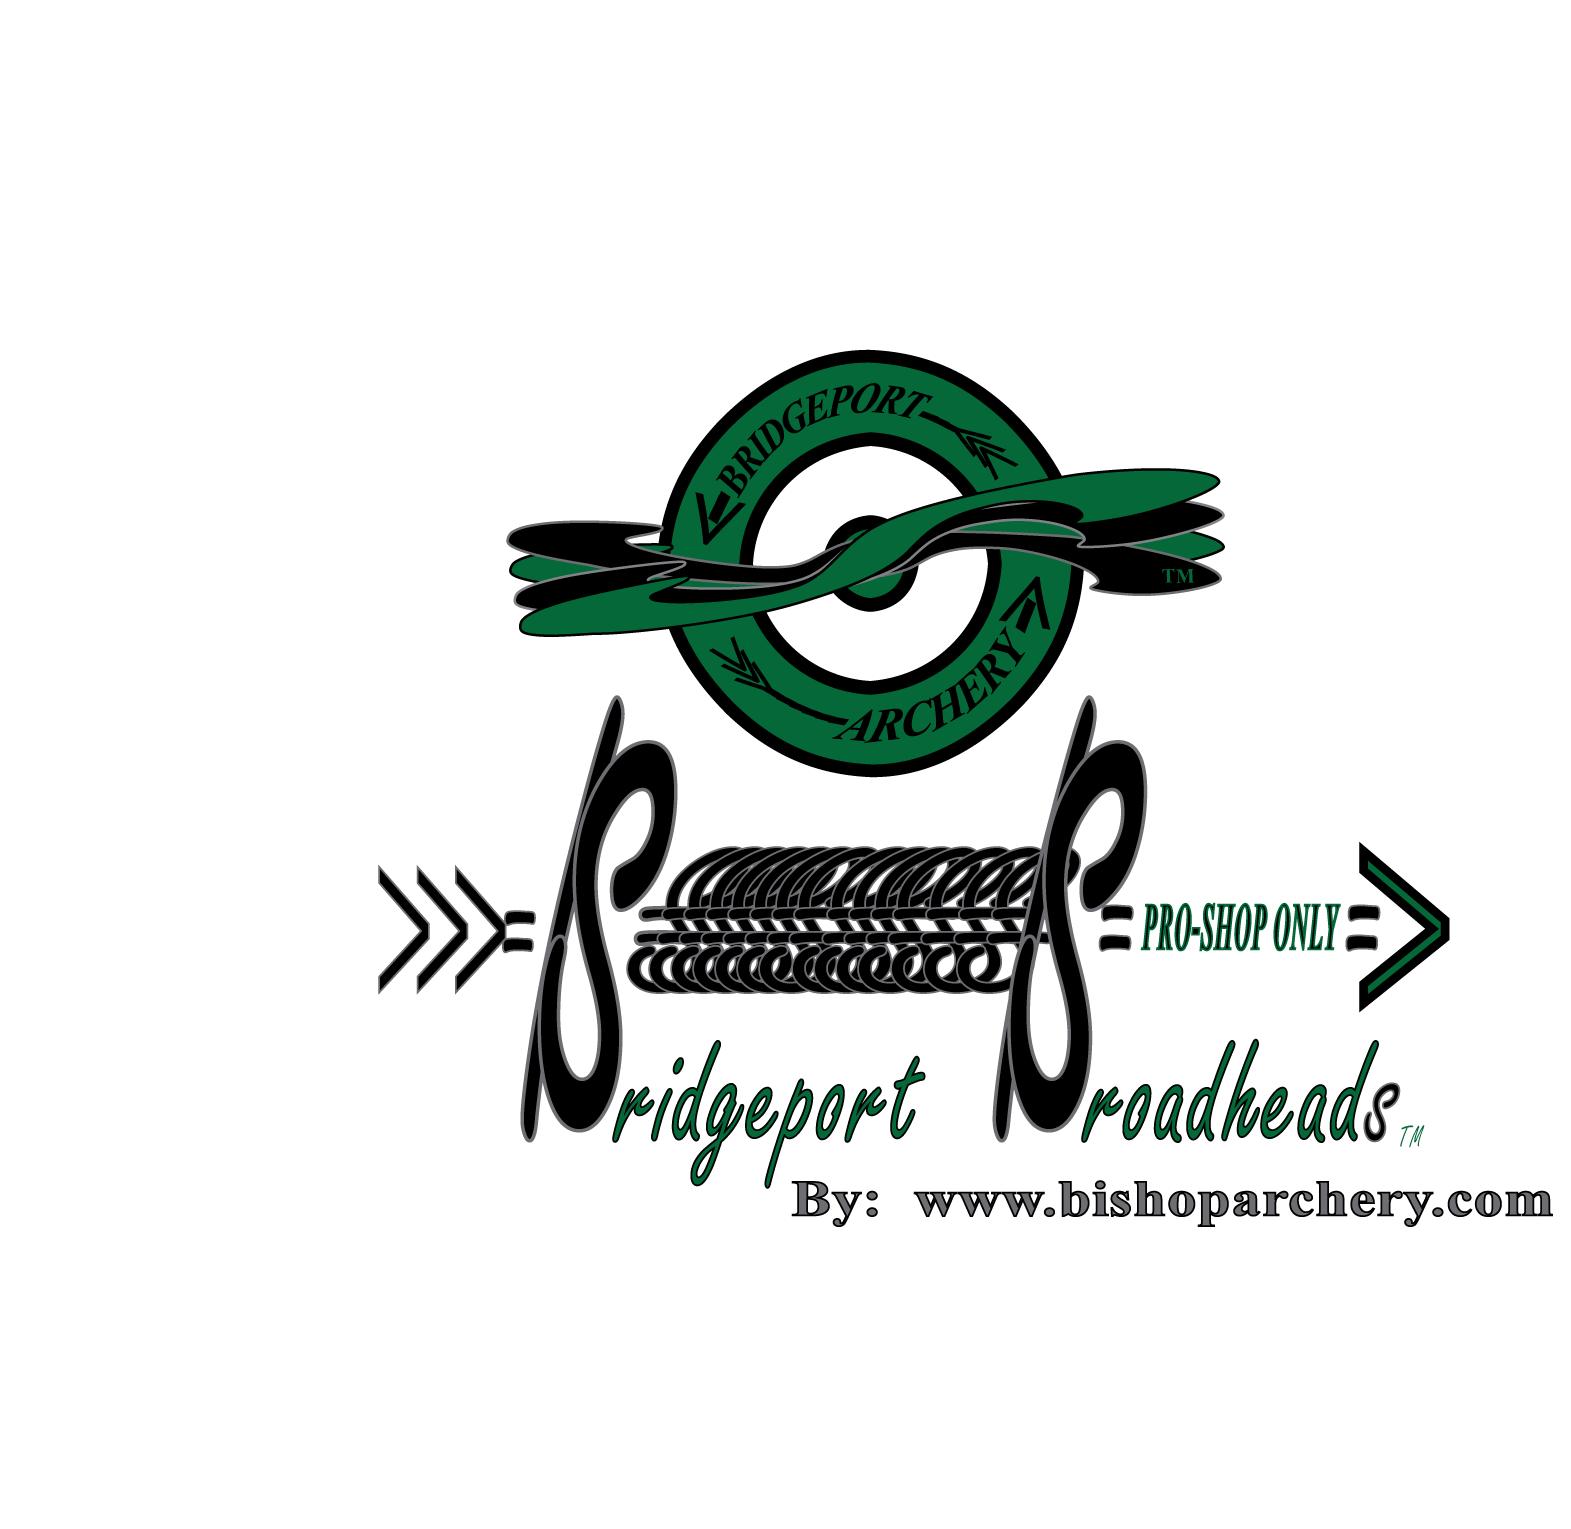 06242016-bridgeport-archery-broadheads-ssssss-logo-by-bishop-60.png